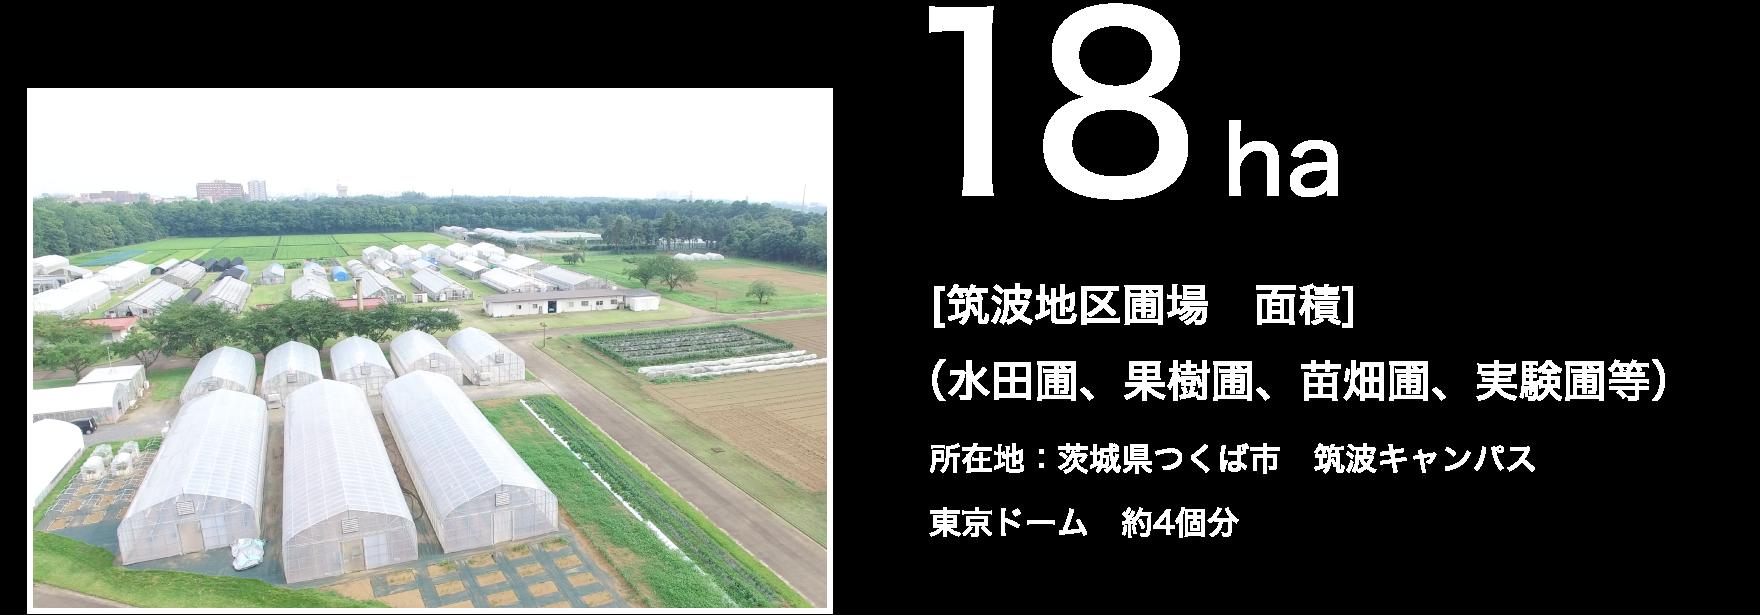 18ha [筑波地区圃場 面積](水田圃、果樹圃、苗畑圃、実験圃等)所在地:茨城県つくば市 筑波キャンパス 東京ドーム 約4個分